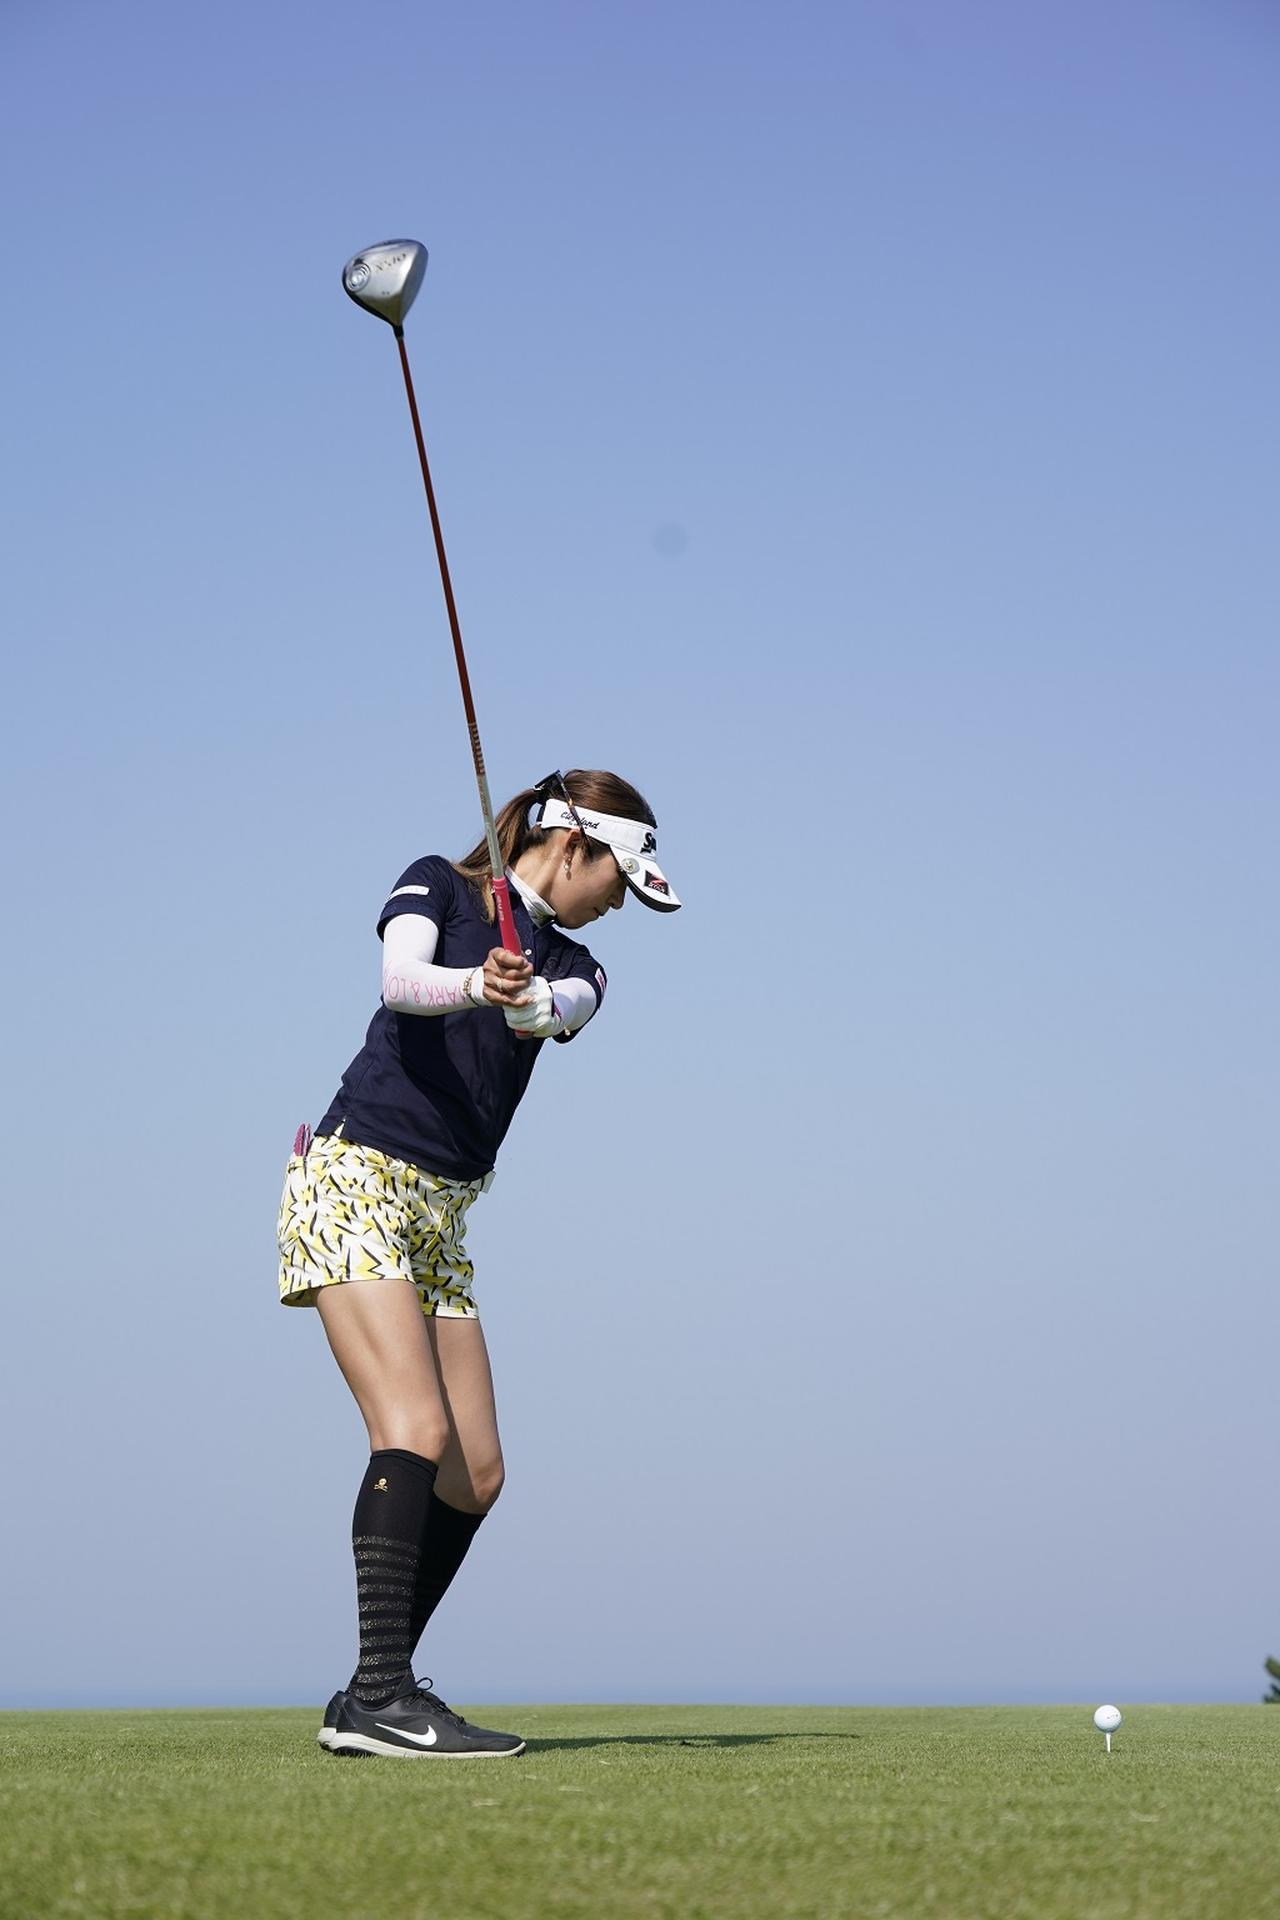 Images : 3番目の画像 - 金田久美子ドライバー後方連続写真 - みんなのゴルフダイジェスト